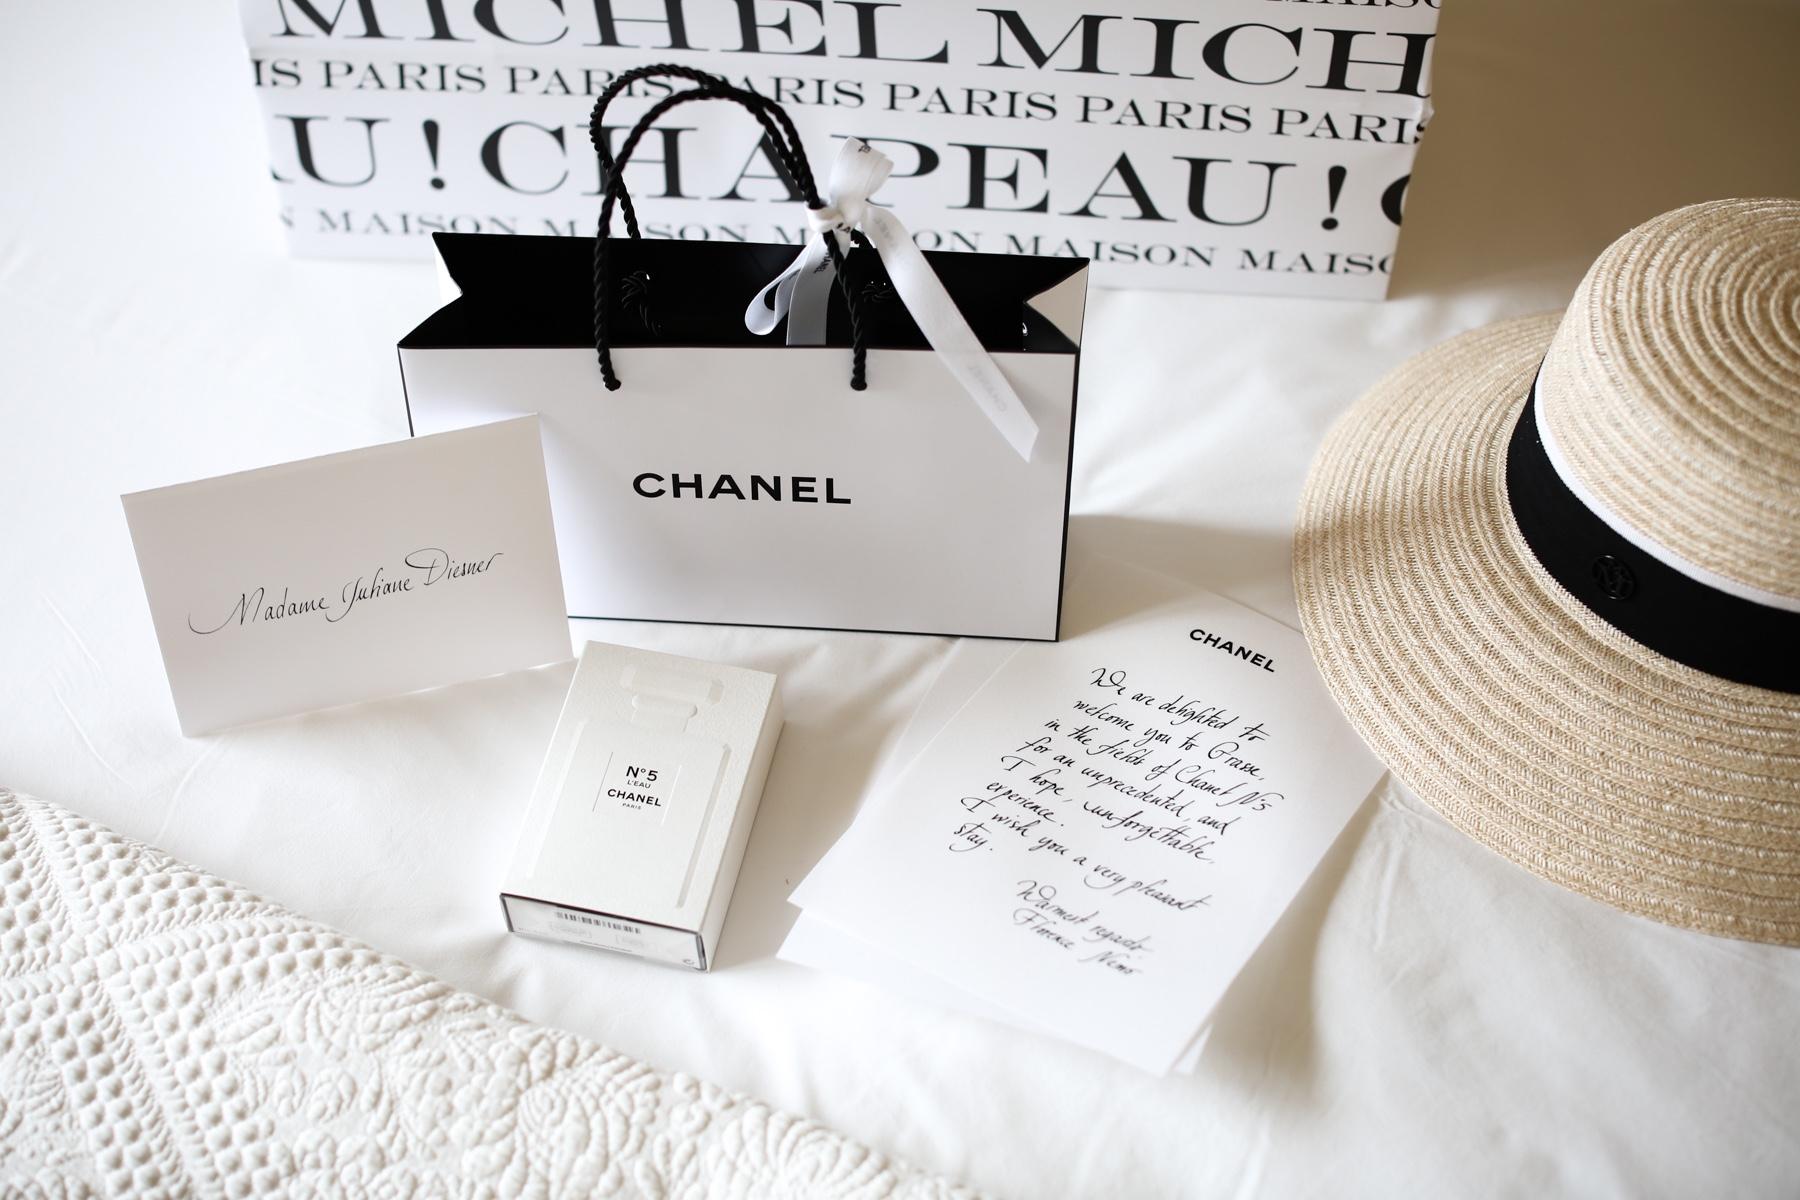 5N4A8821; Chanel L'eau